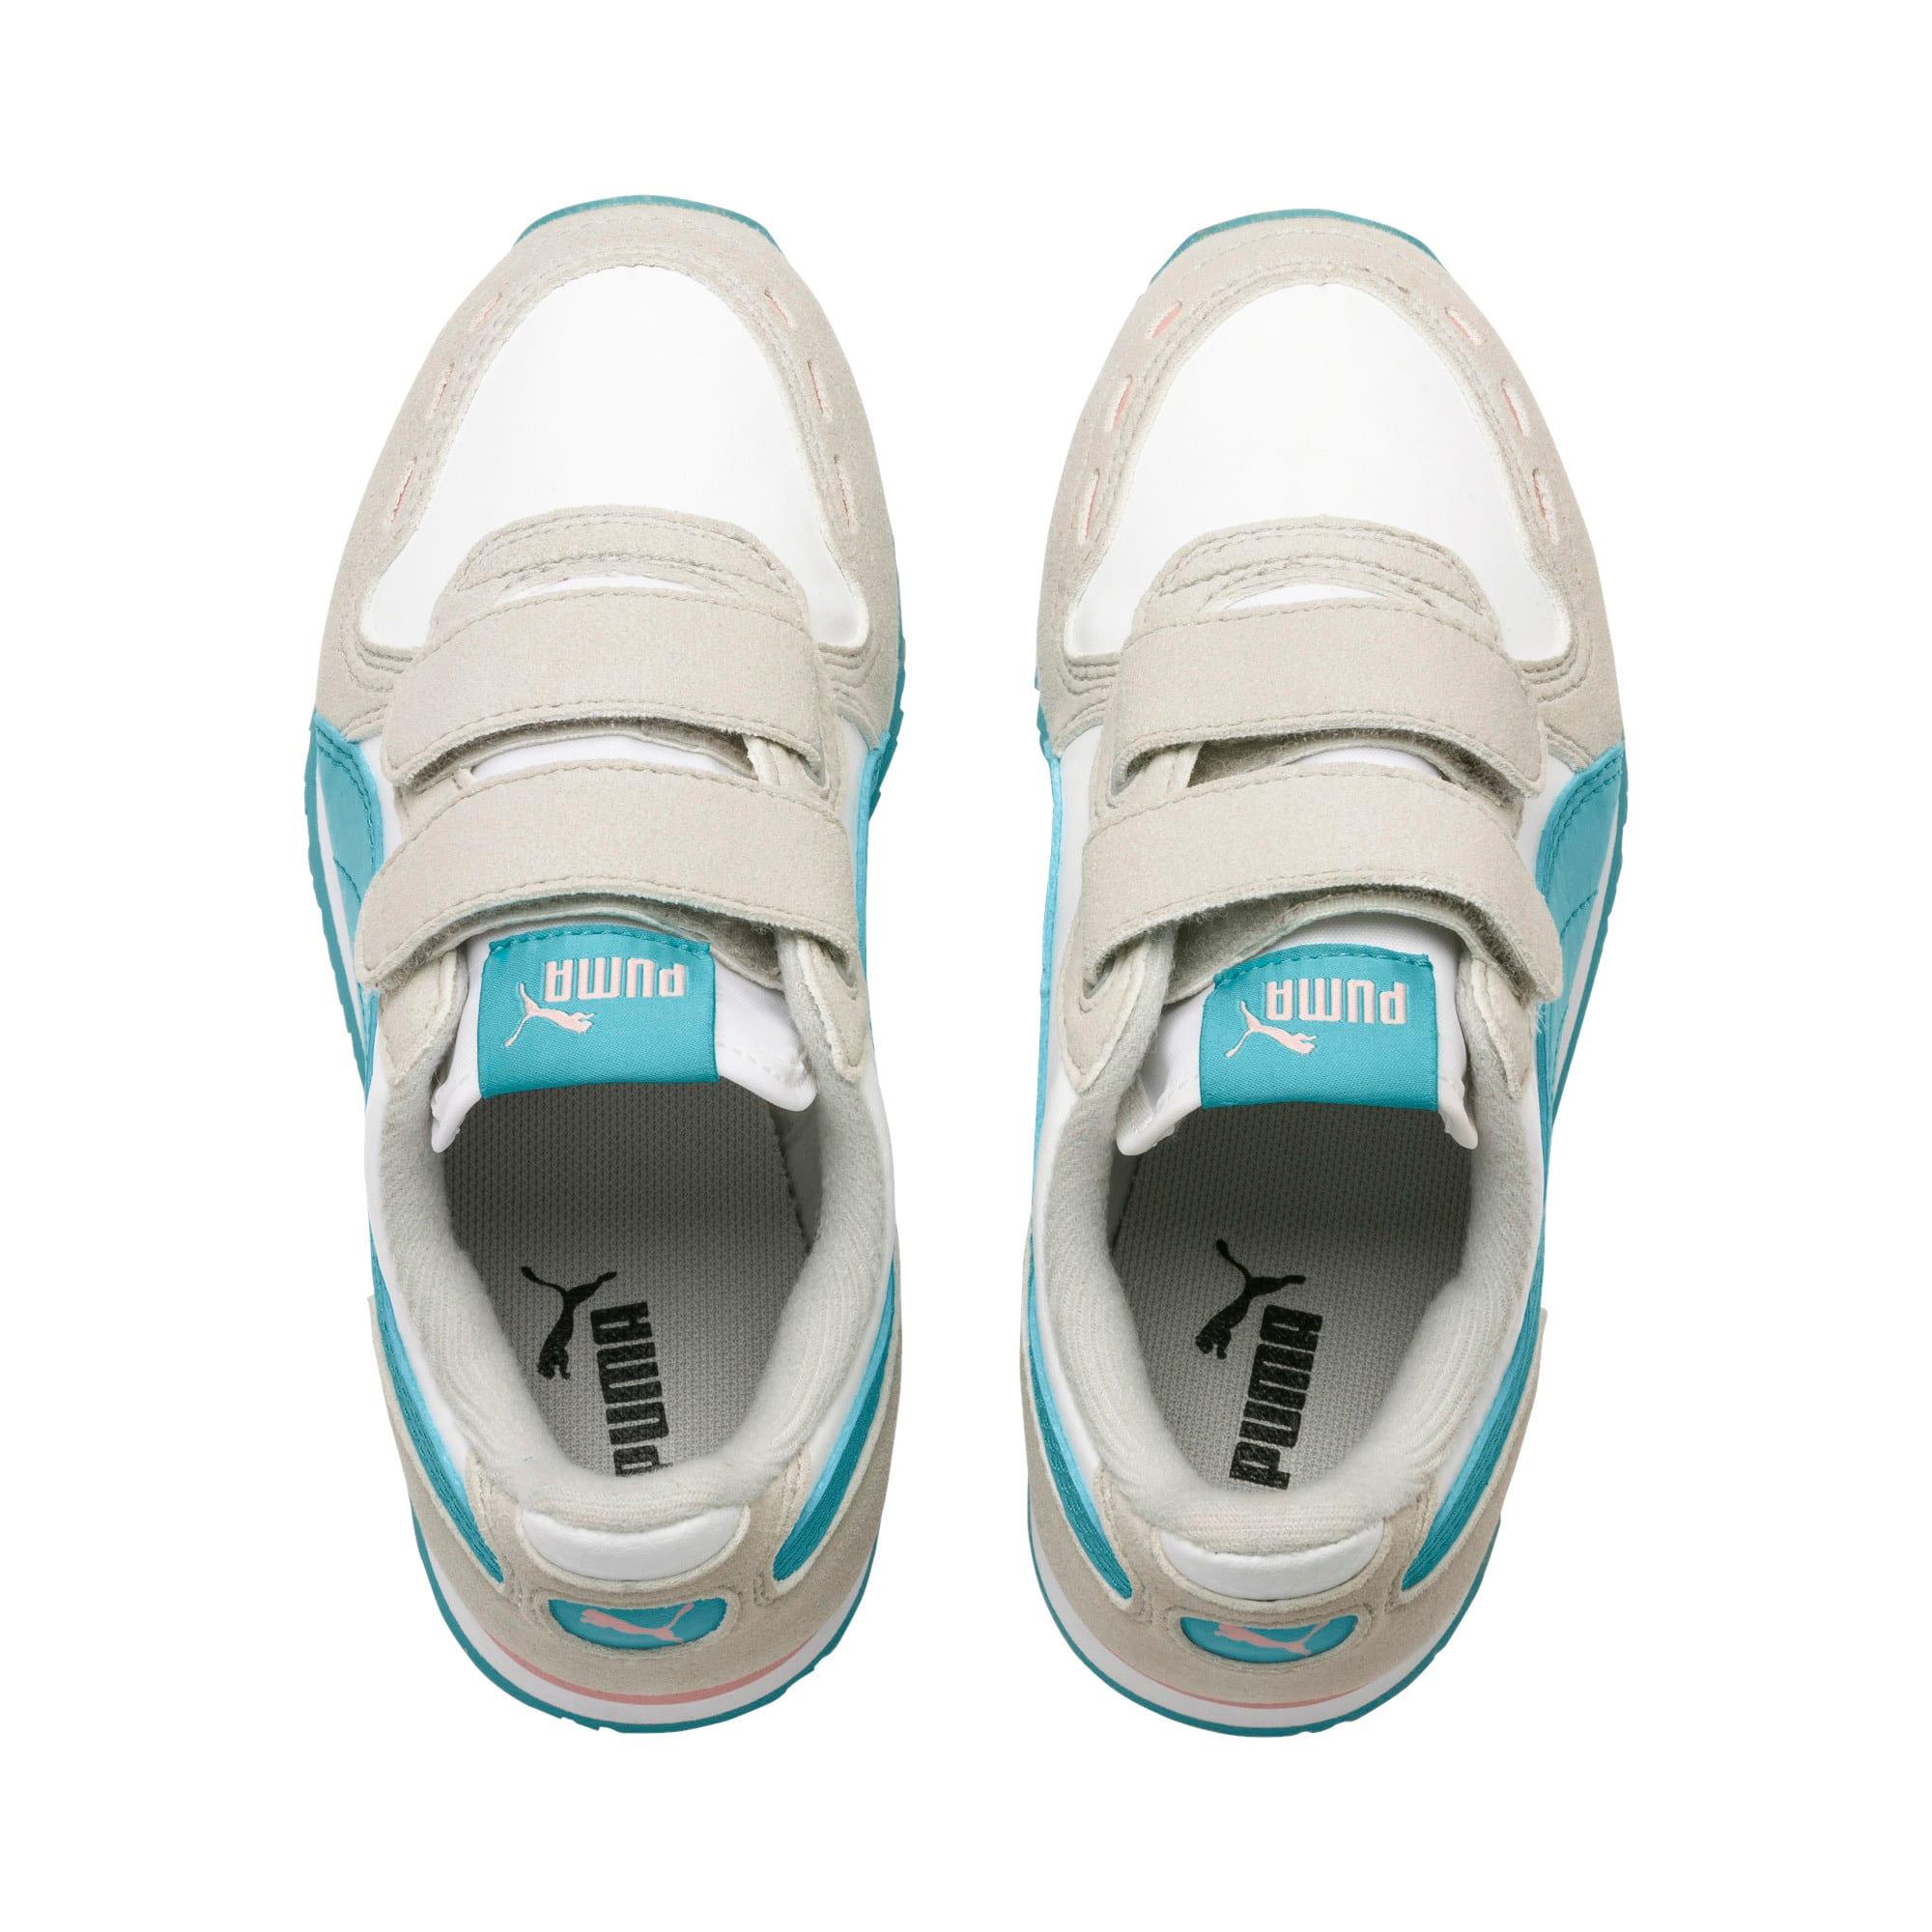 Thumbnail 6 of Cabana Racer SL AC Little Kids' Shoes, Puma White-Milky Blue, medium